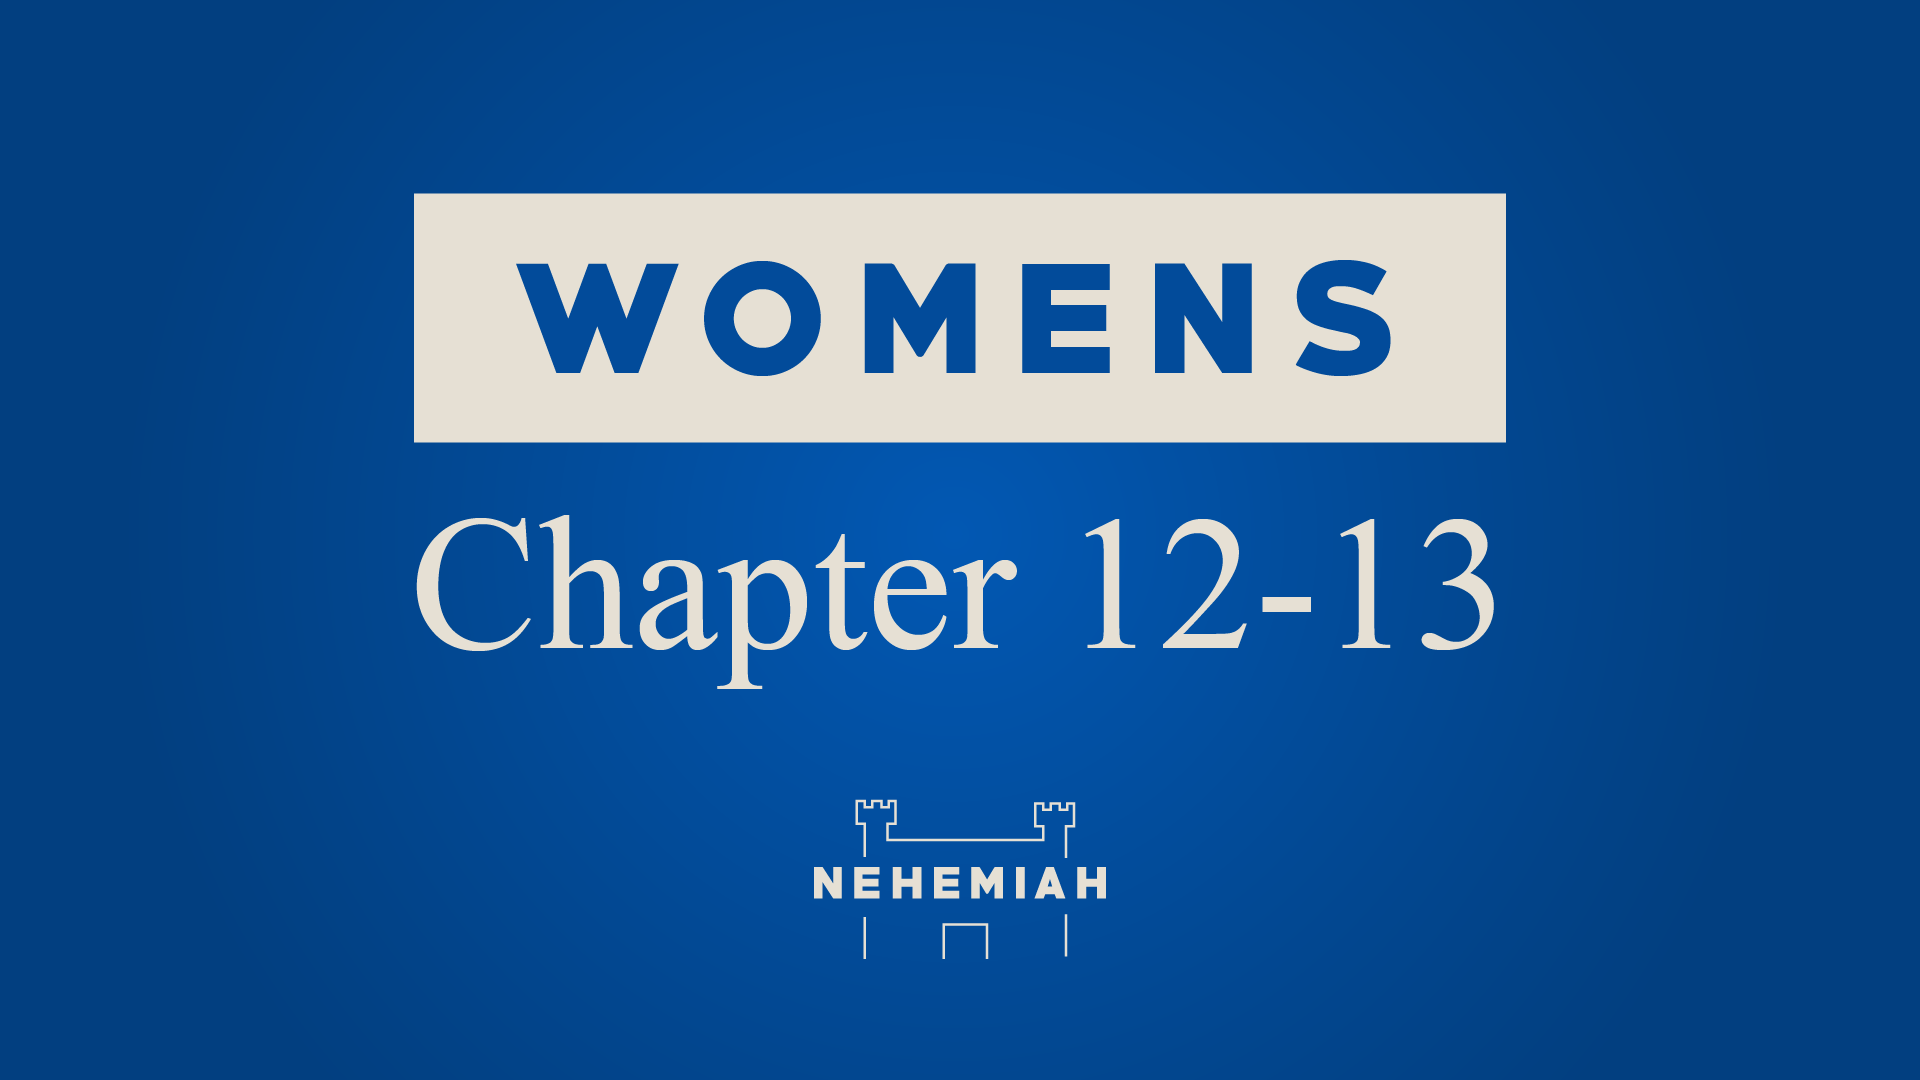 Nehemiah-BS_Women-12-13.png